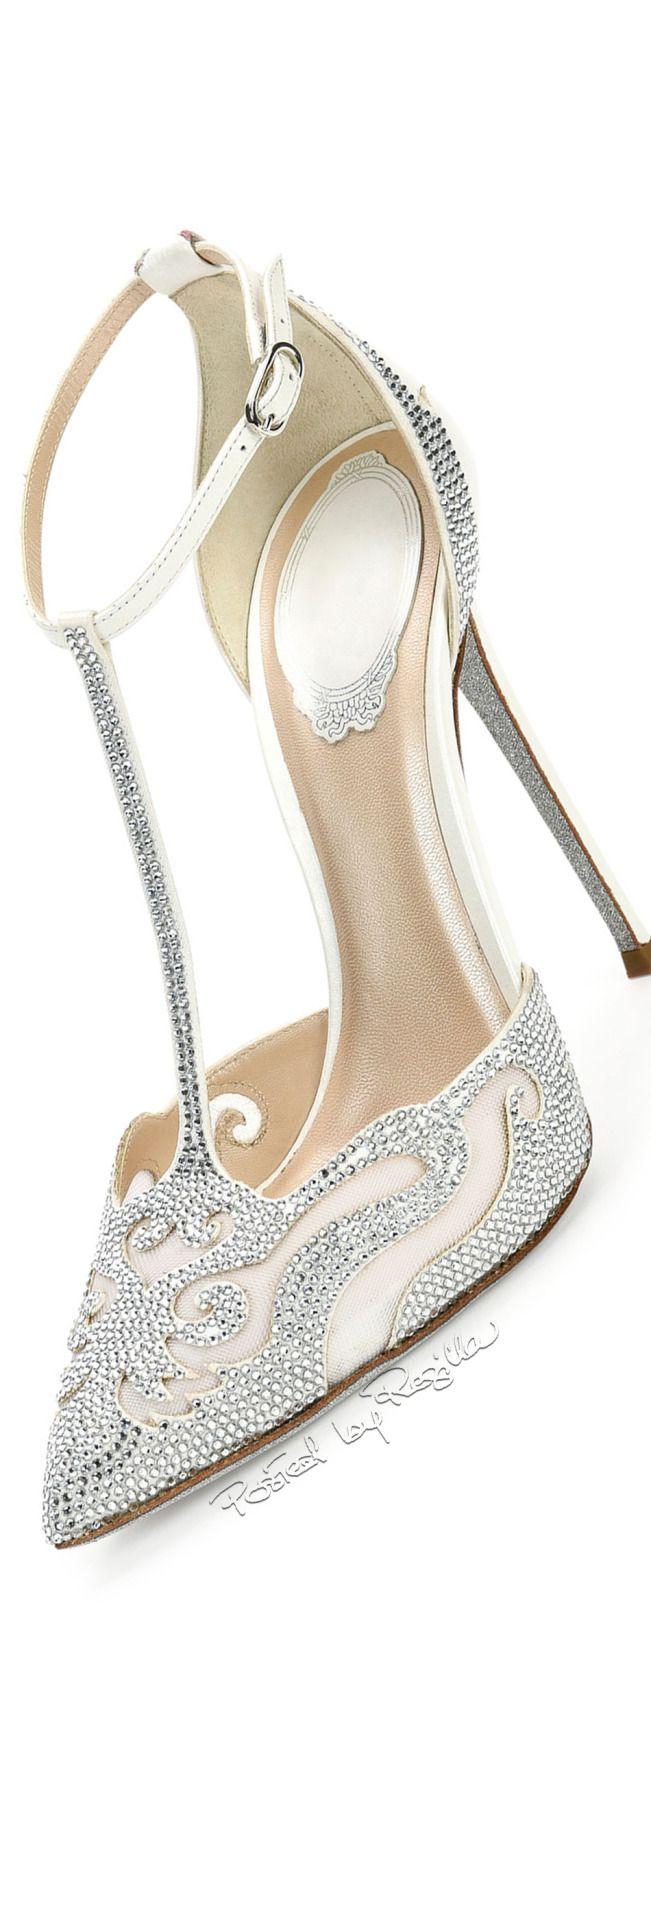 Rhinestone embellished heels #wedding-pinned by wedding decorations specialists http://dazzlemeelegant.com